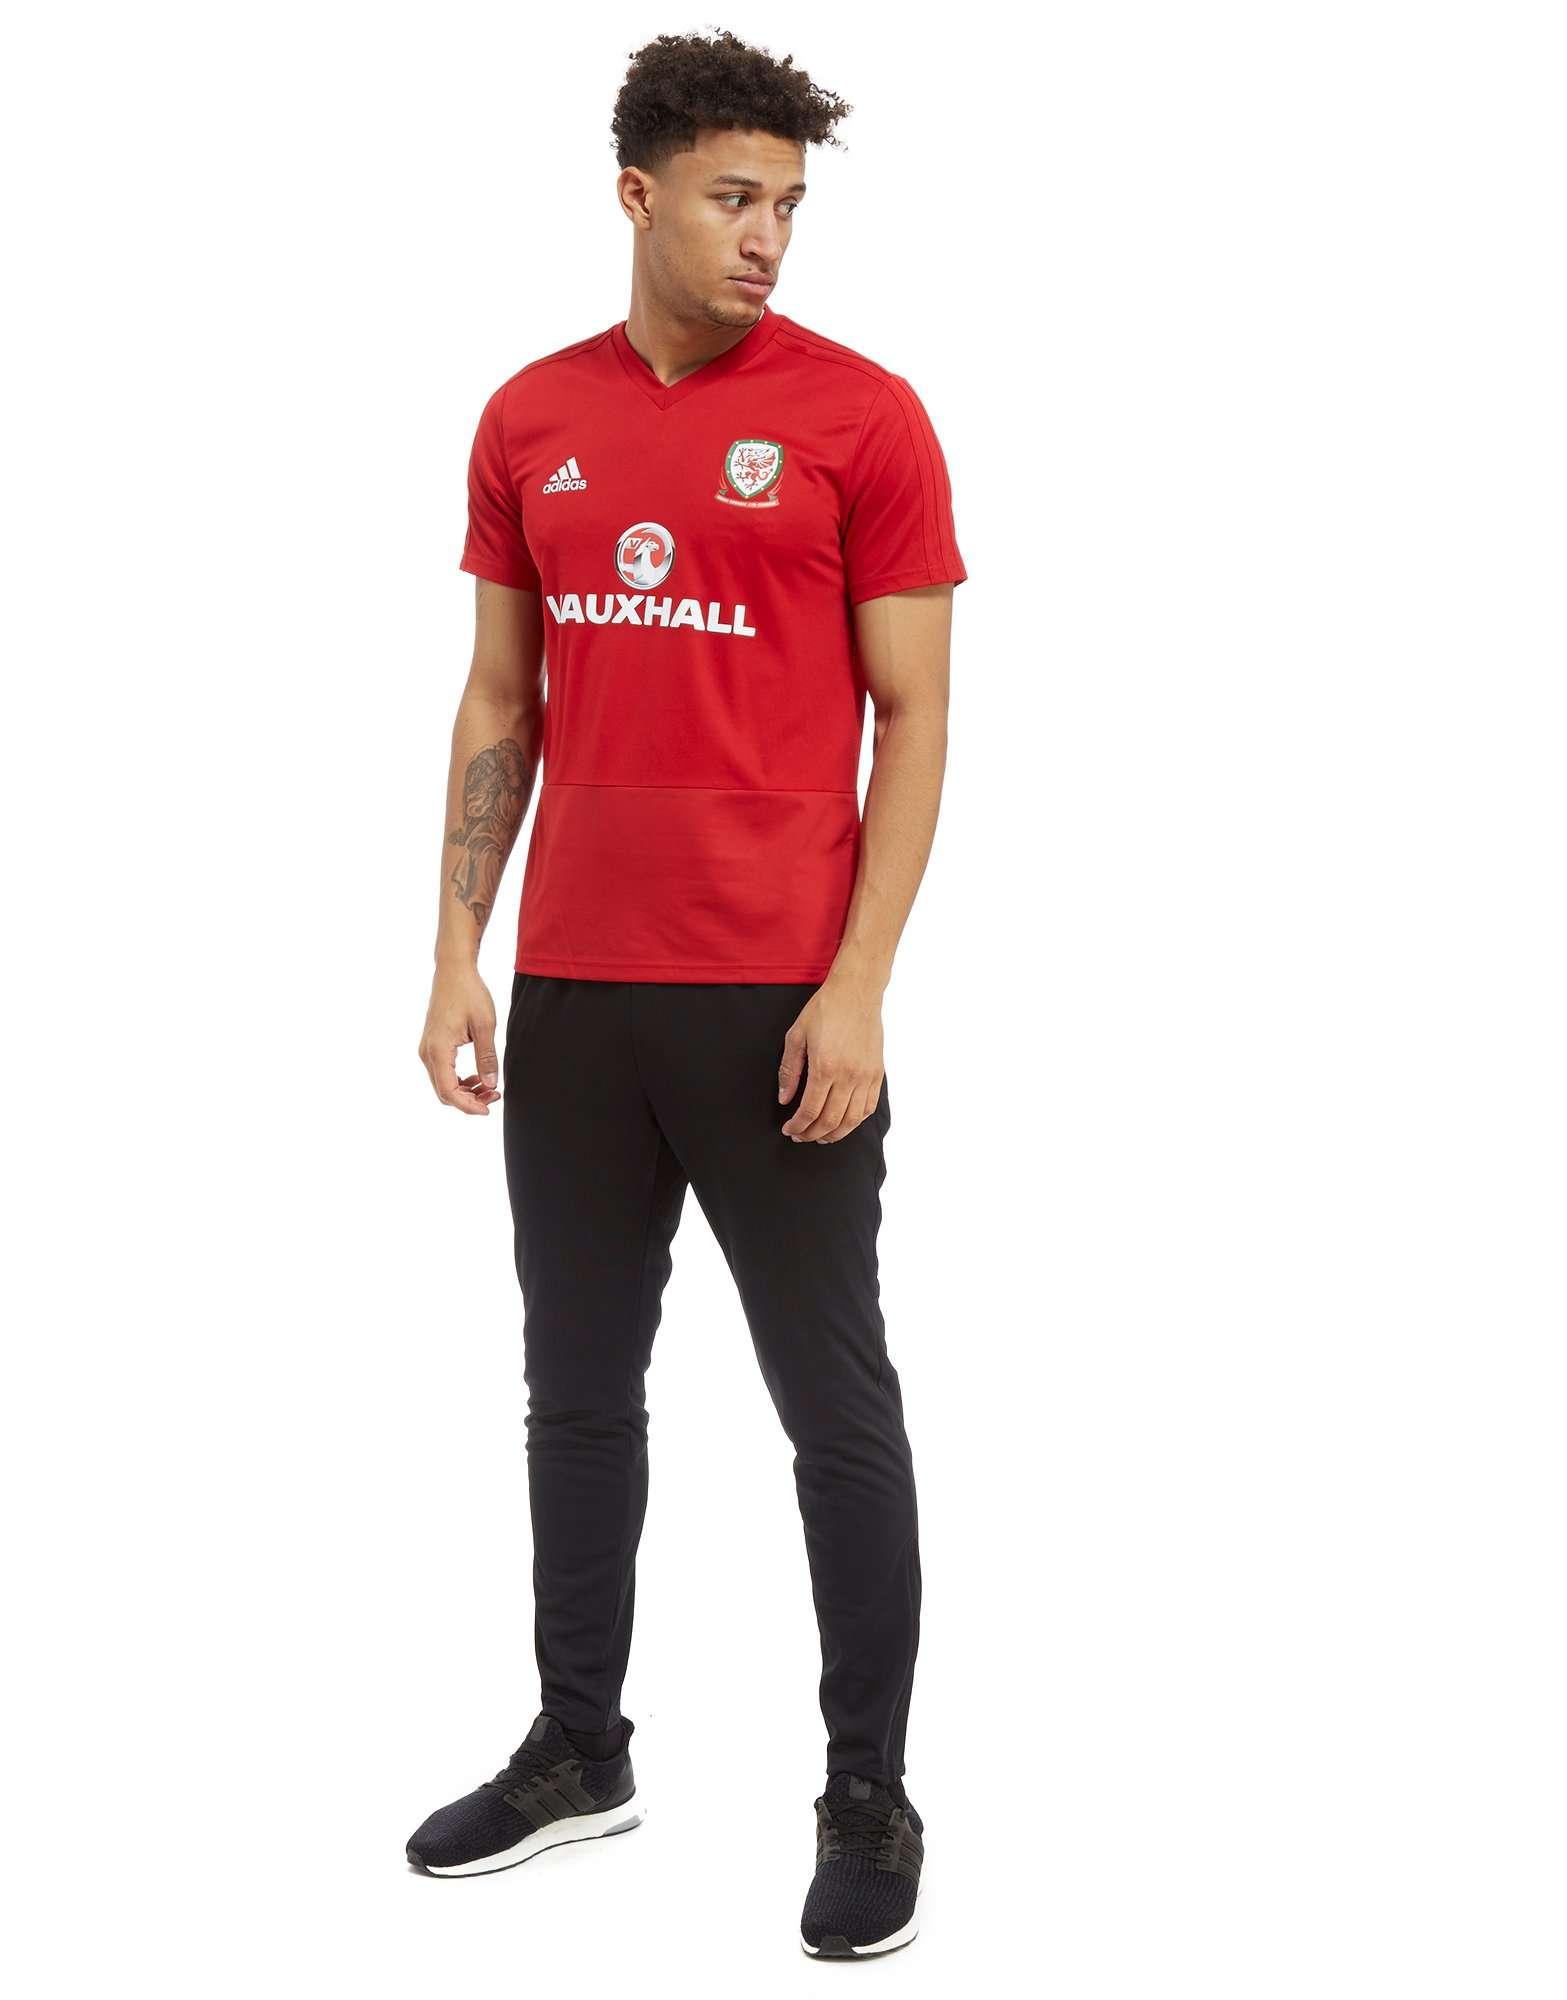 adidas FA Wales 2018/19 Training Shirt